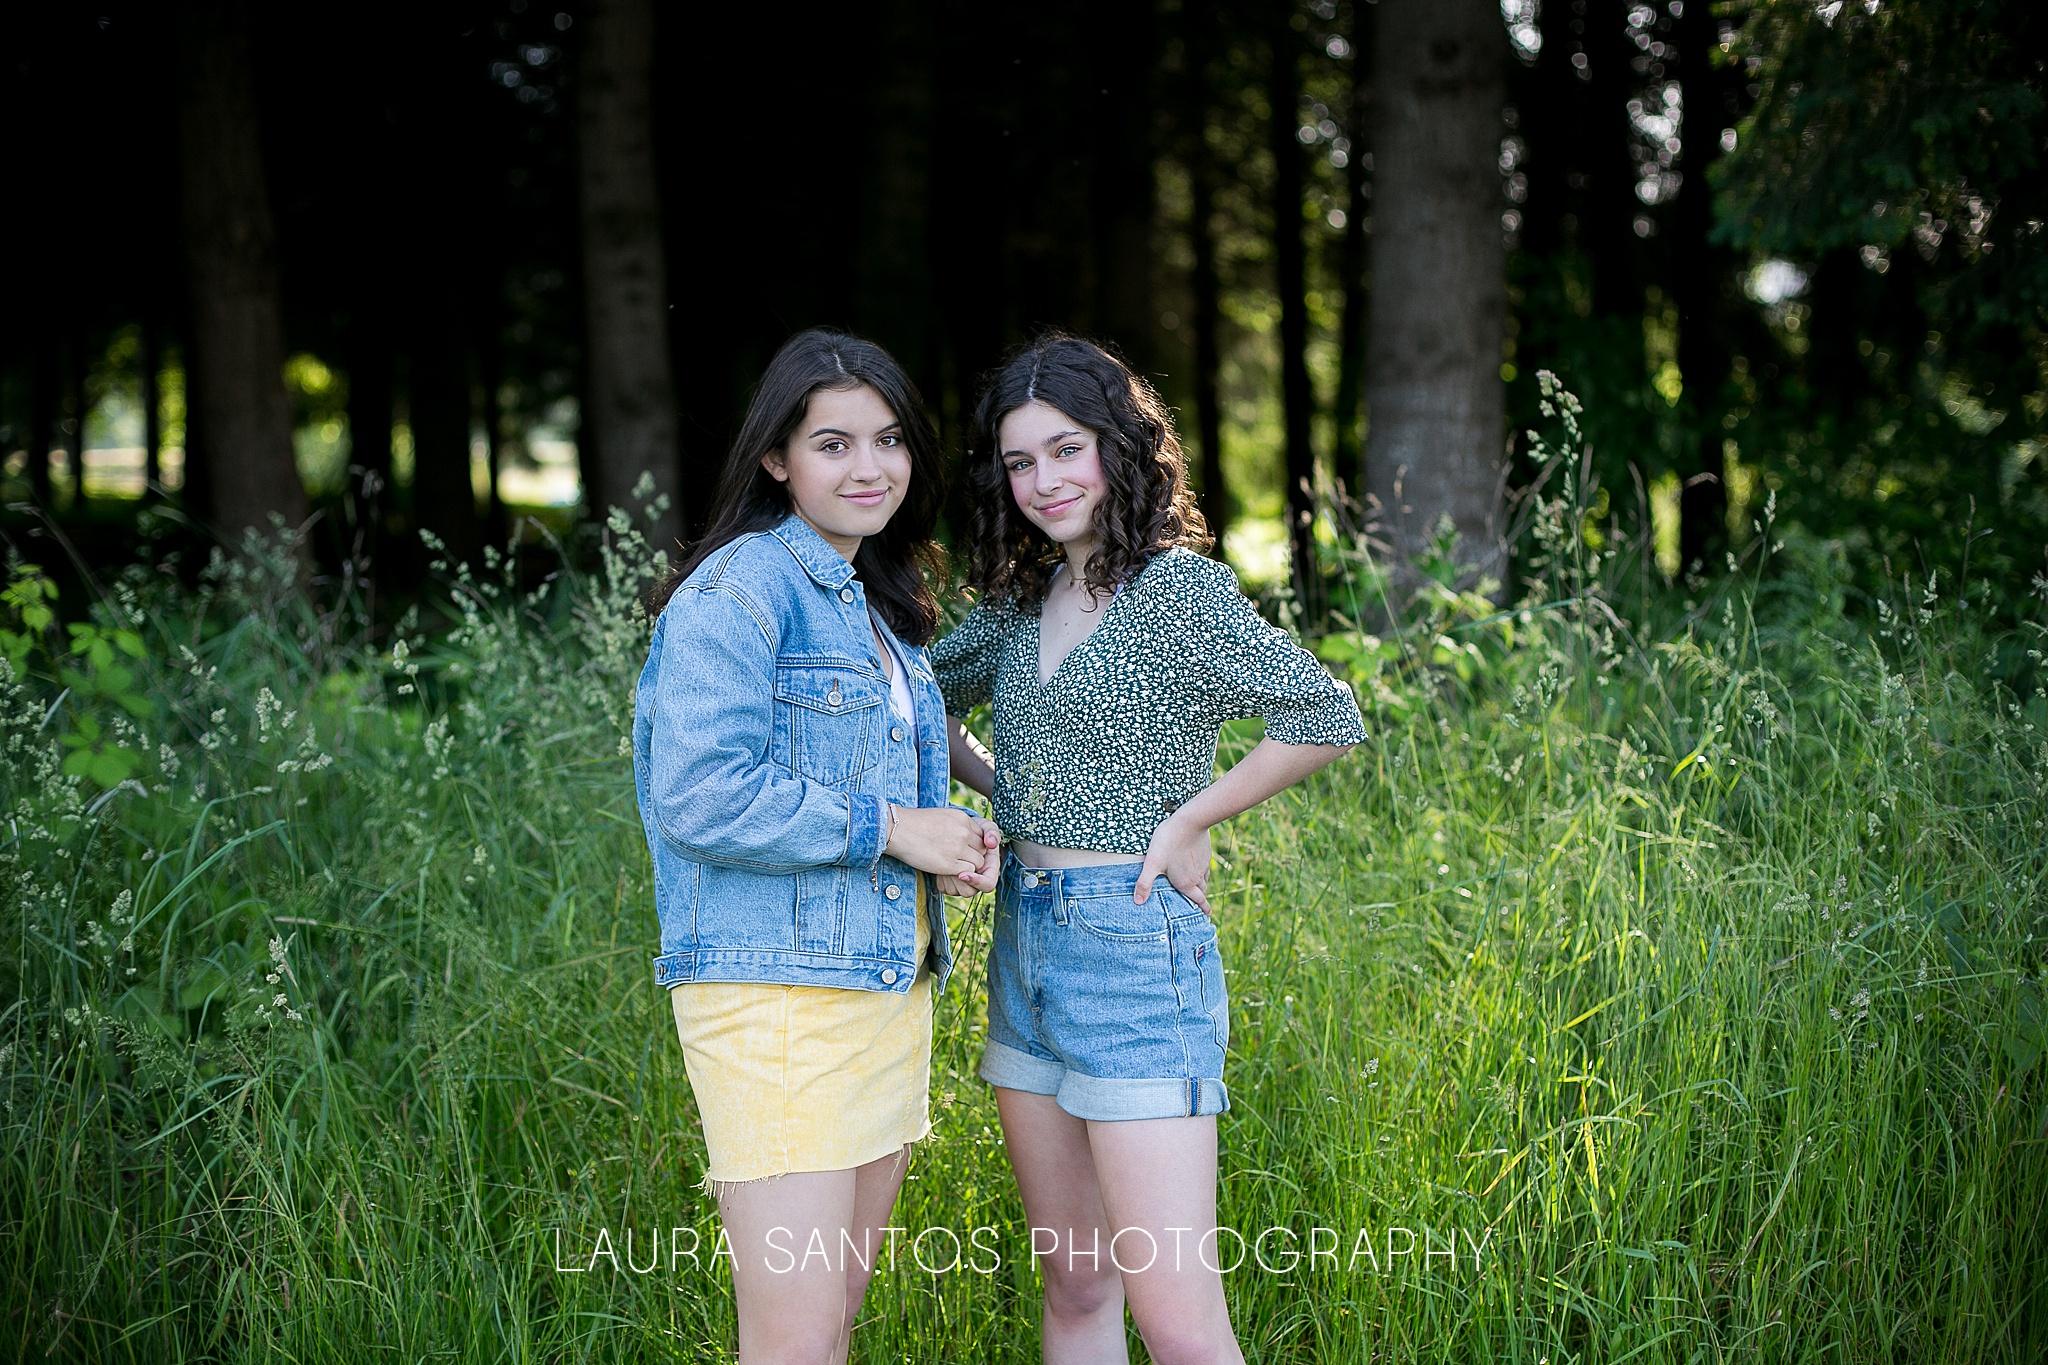 Laura Santos Photography Portland Oregon Family Photographer_0999.jpg